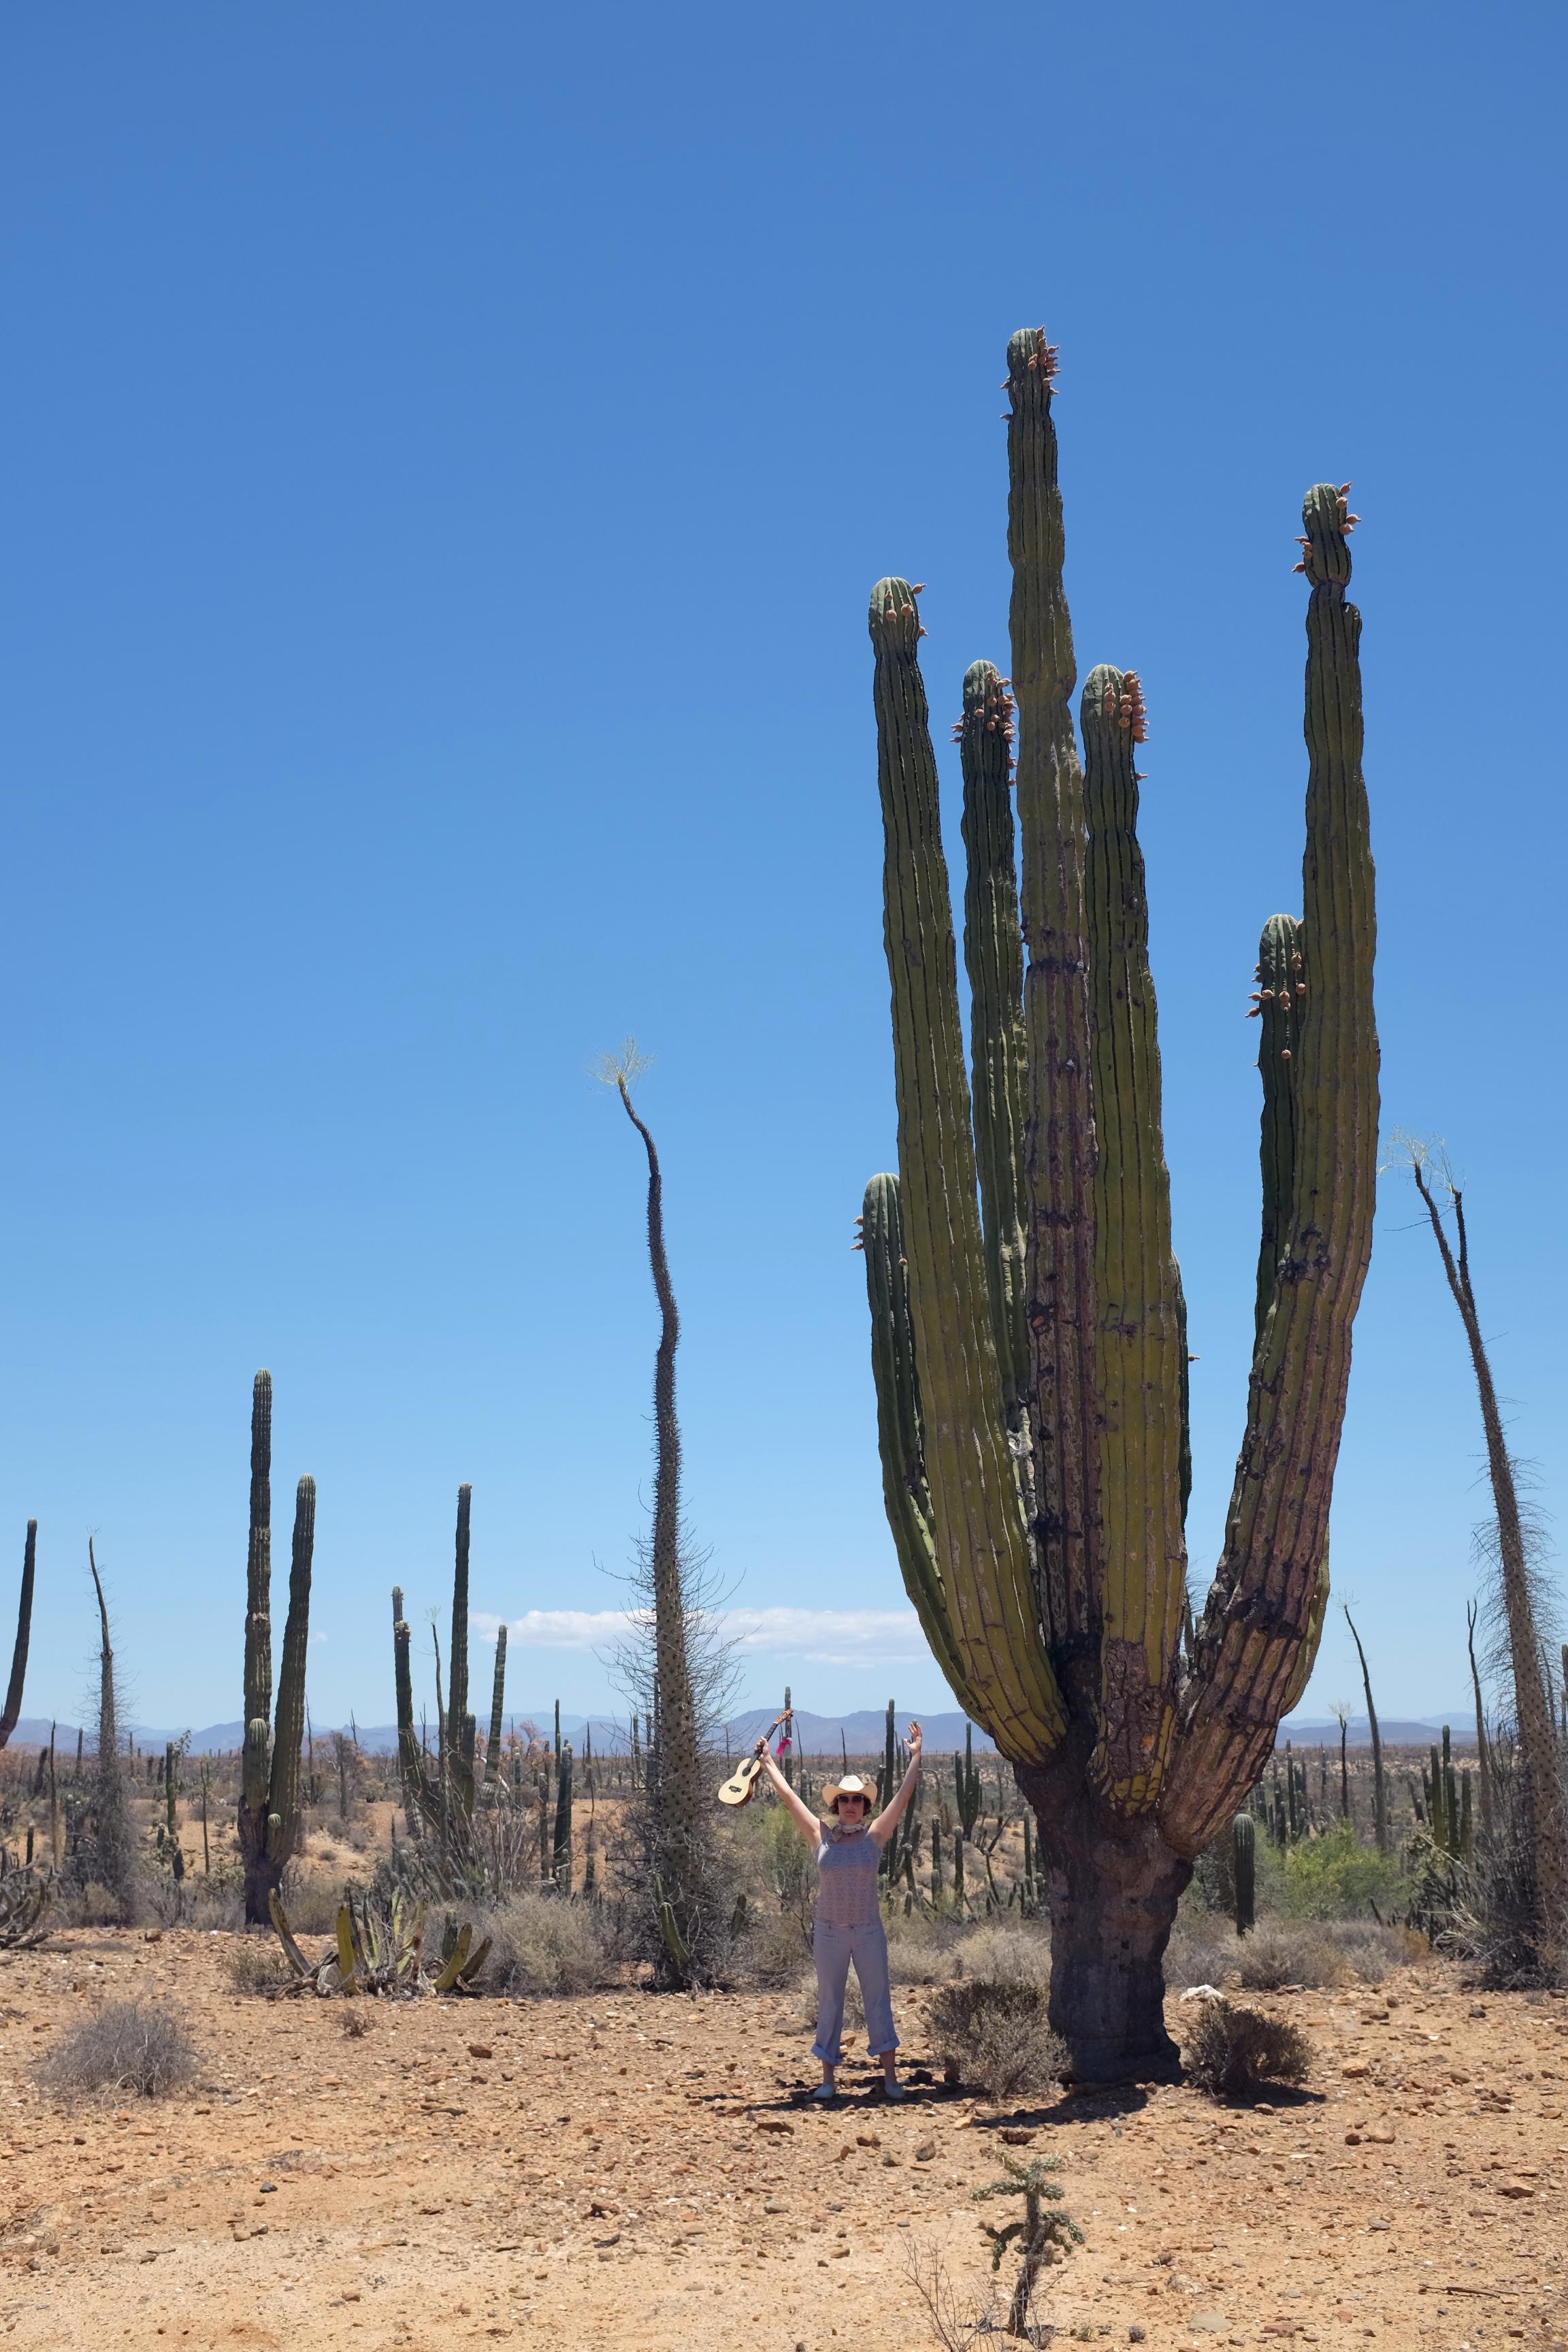 zoe and the cactus.jpg